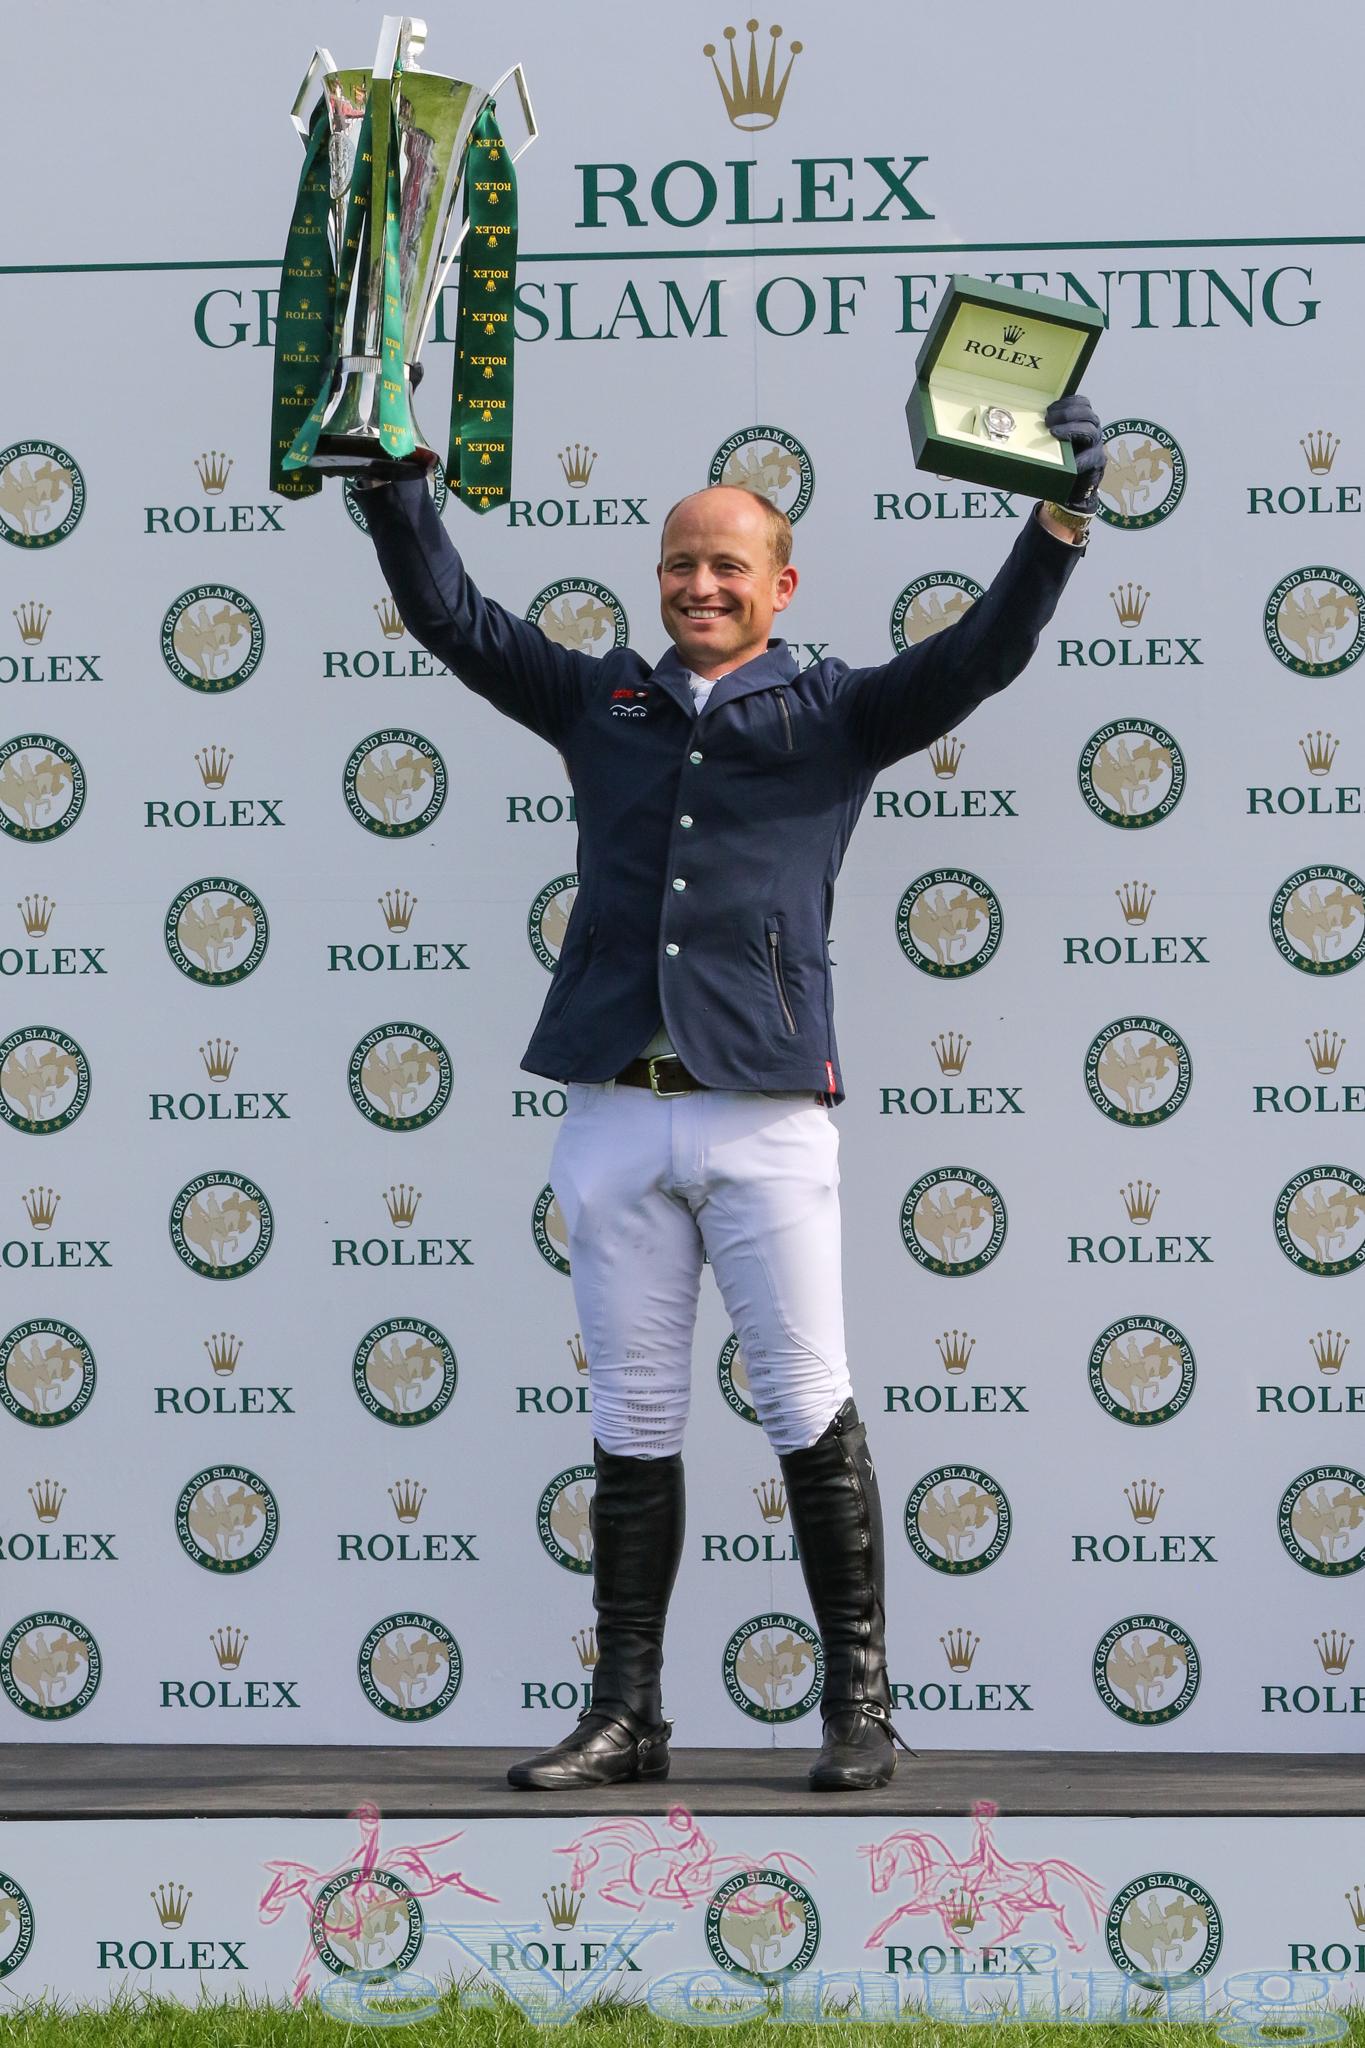 Michael Jung, Rolex Grand Slam of Eventing Winner